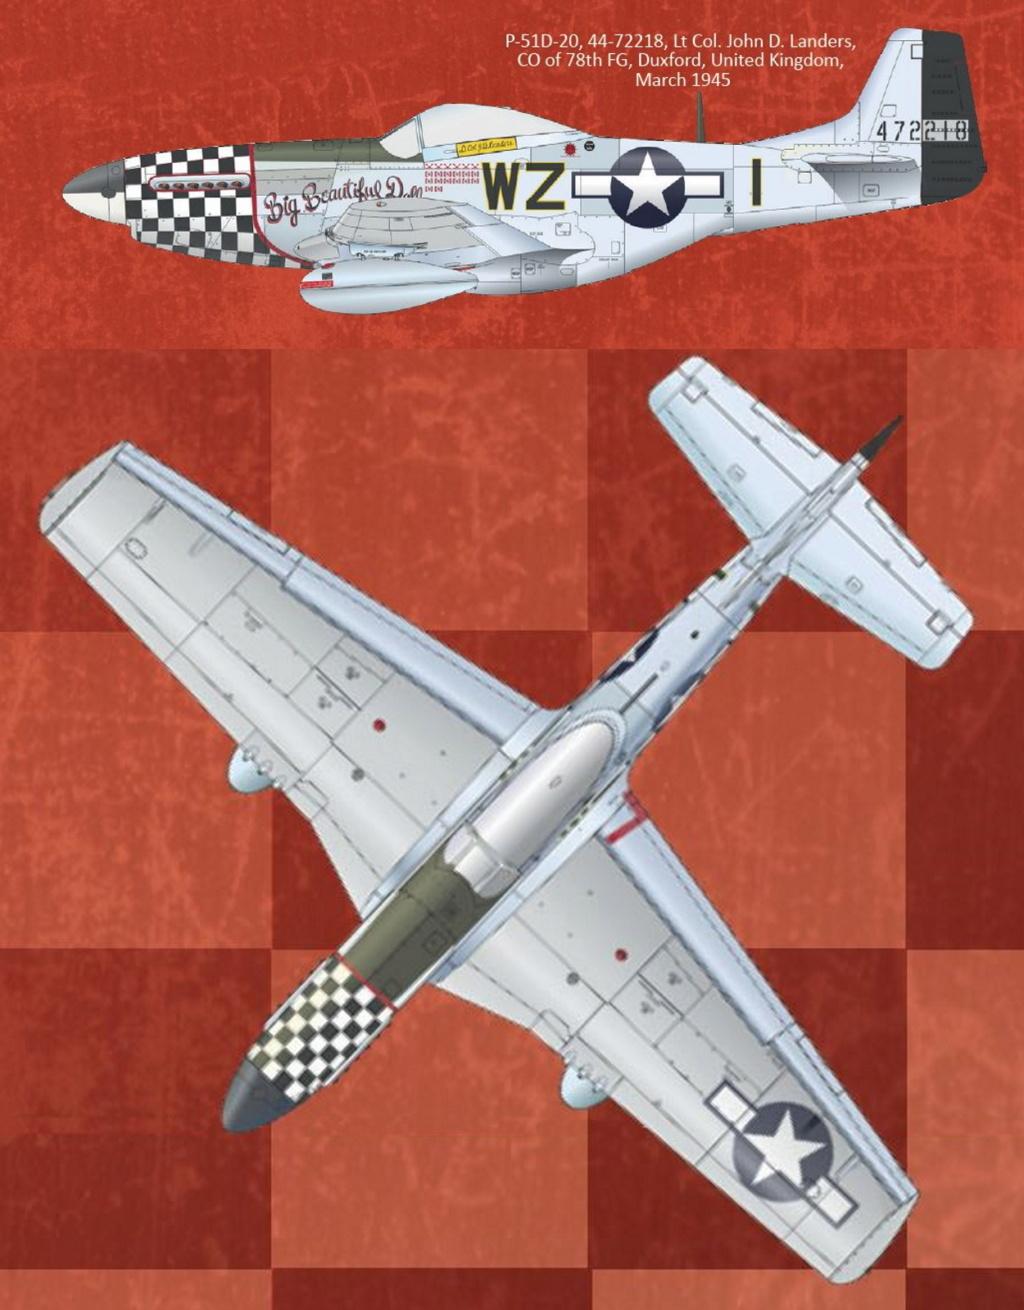 NORTH AMERICAN P-51 MUSTANG P51-5-14